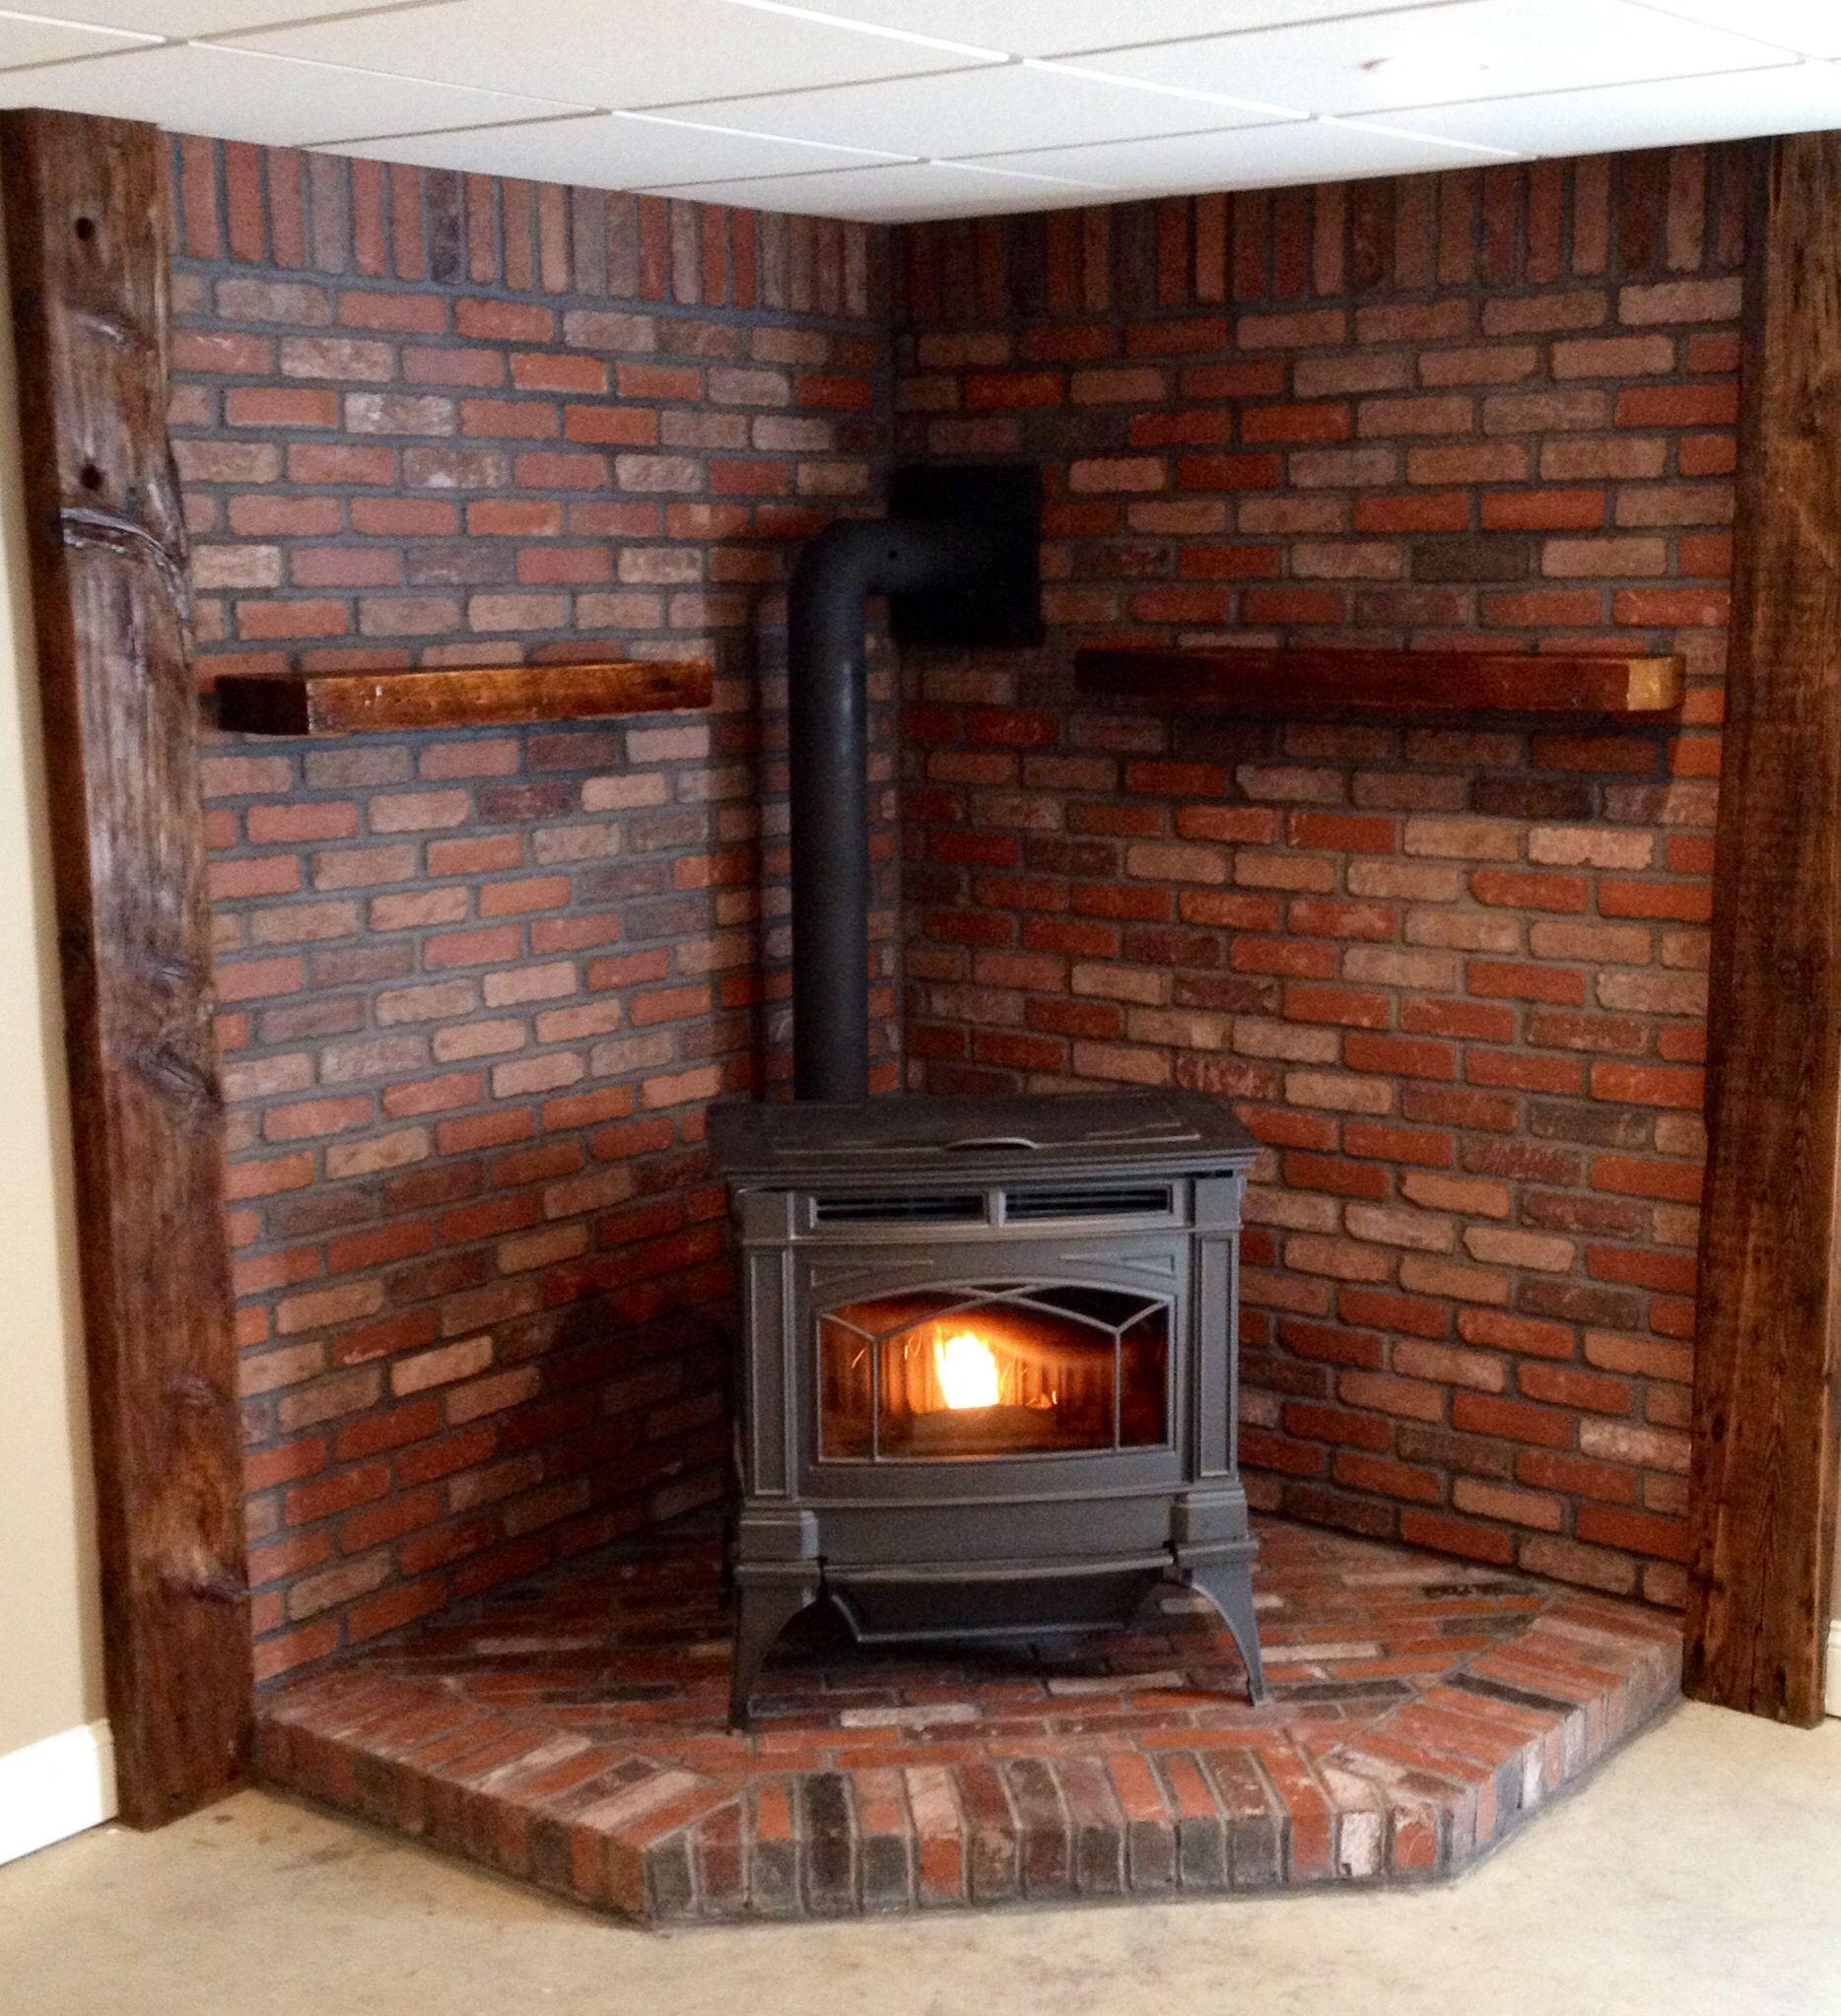 Brick Hearth Brick Hearth Wood Stove Surround Wood Stove Fireplace